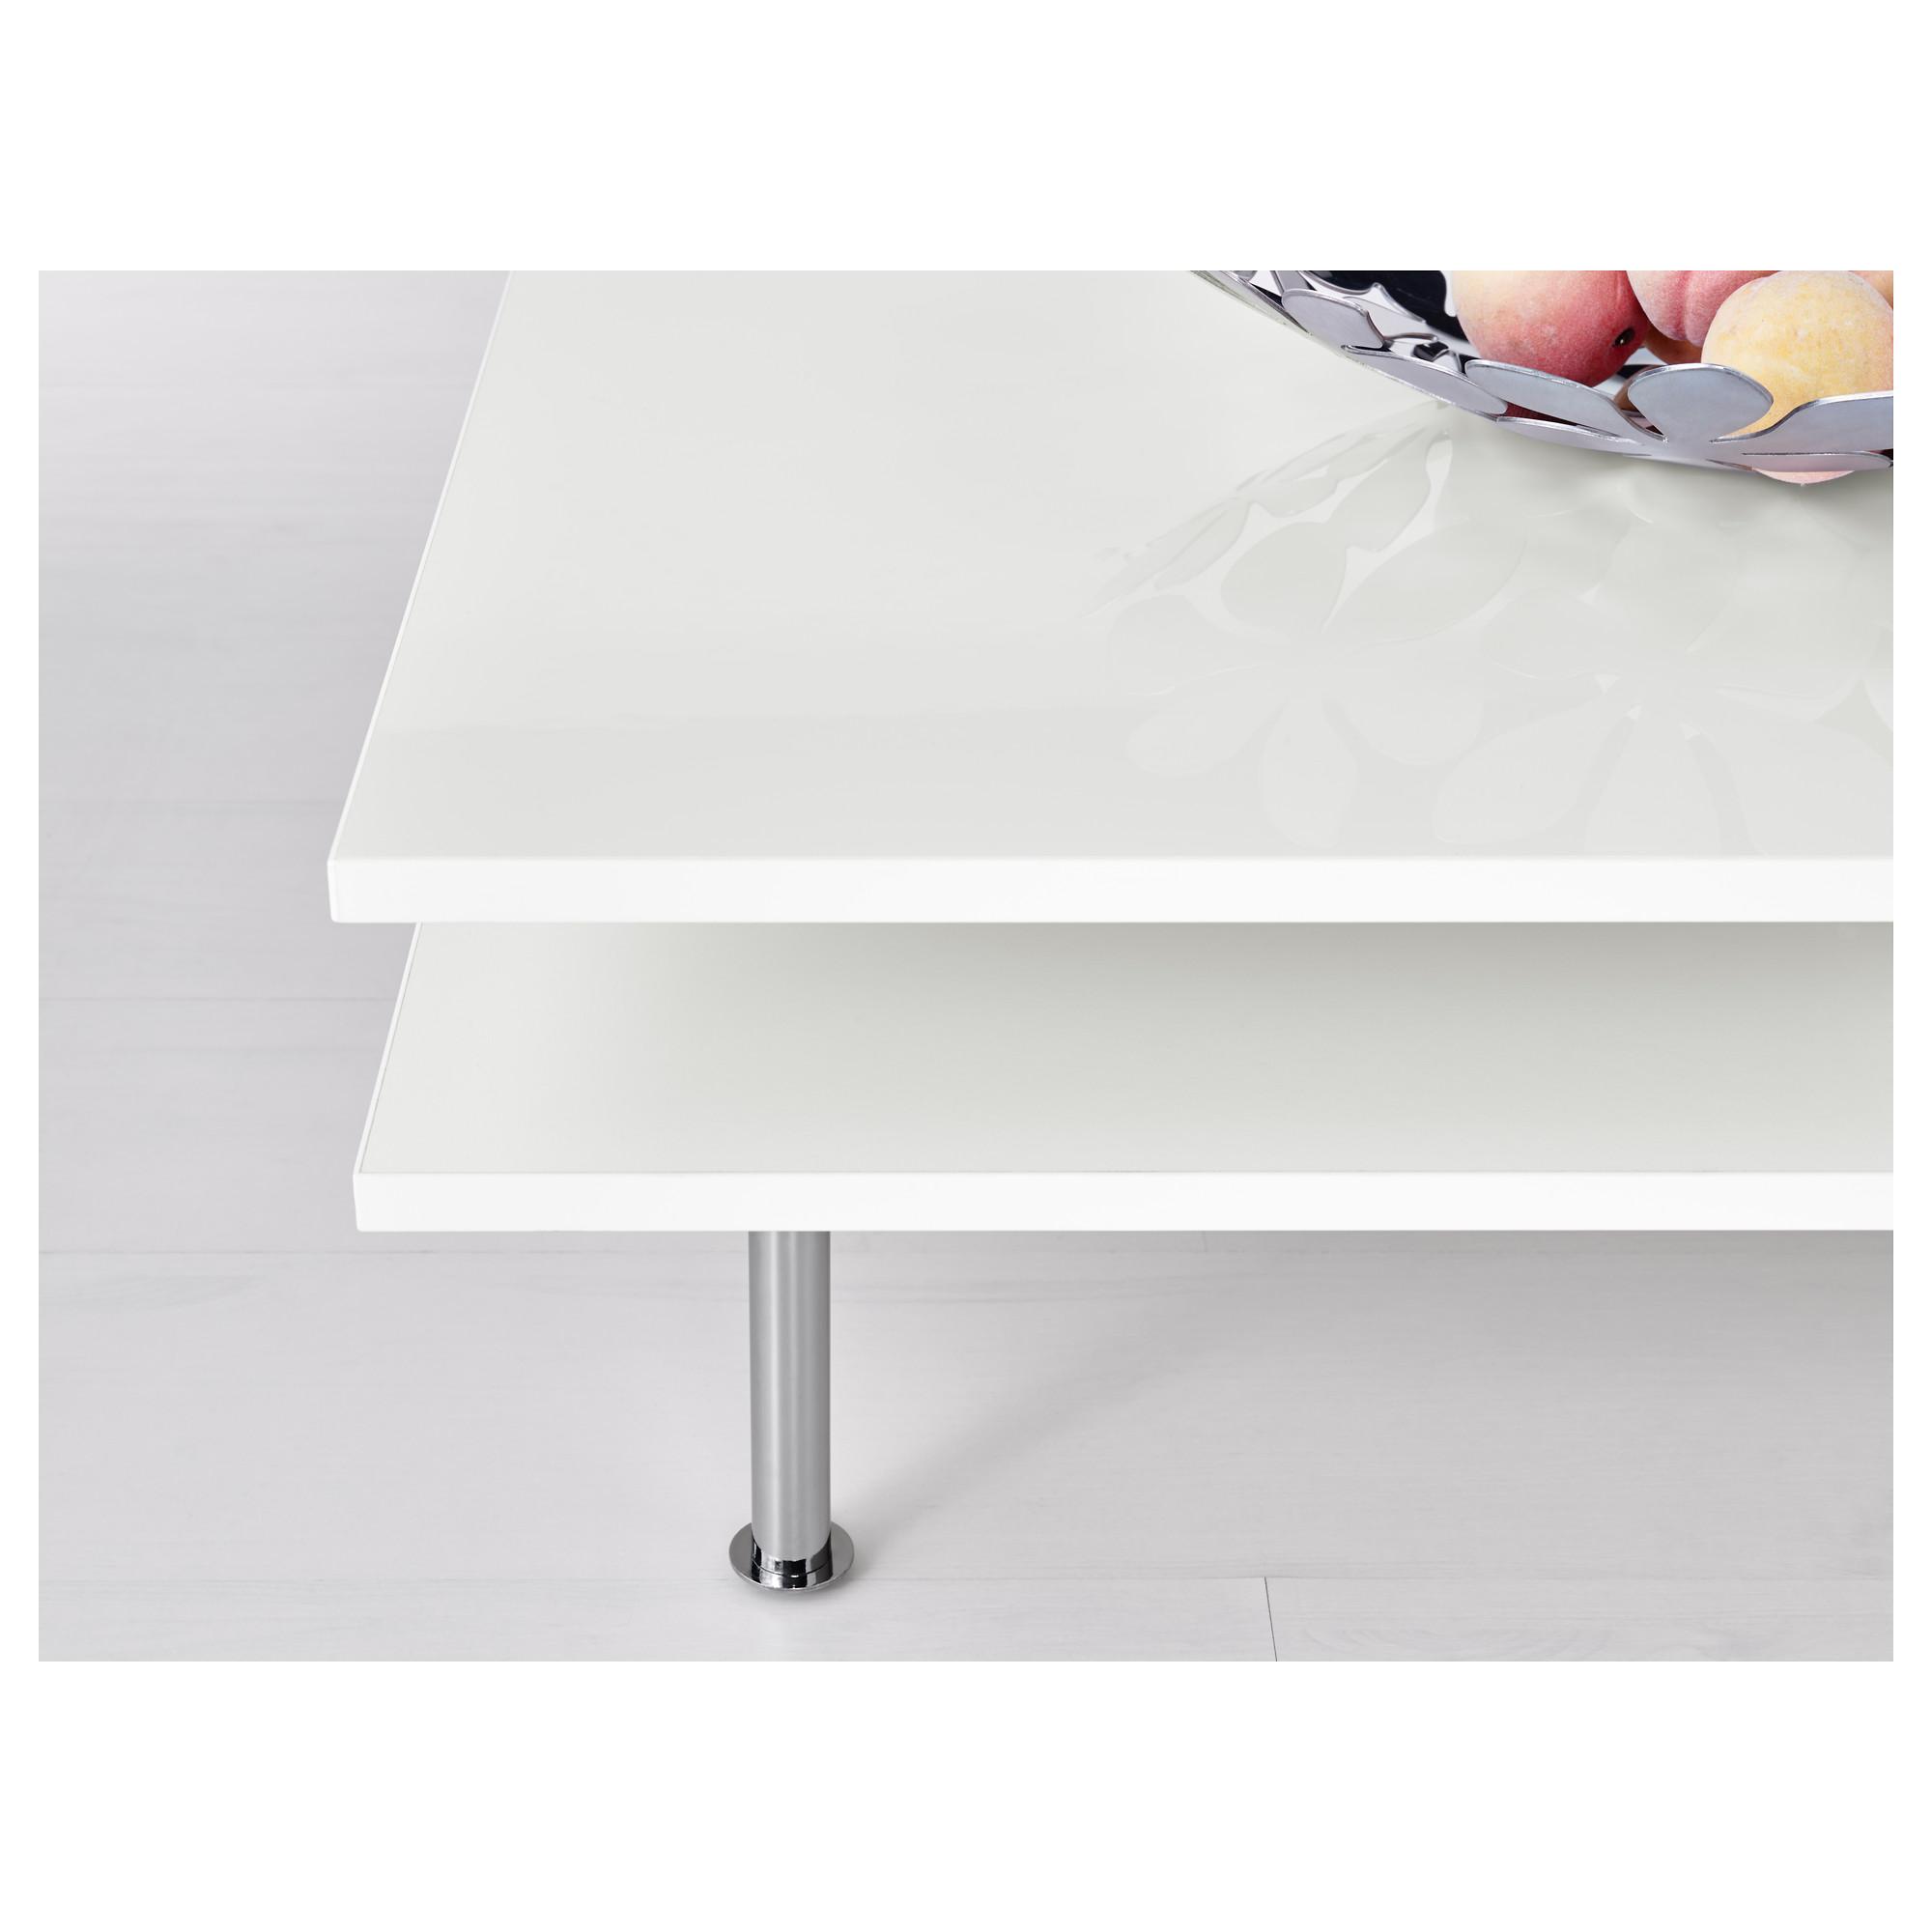 TOFTERYD Coffee table high gloss white IKEA Coffee